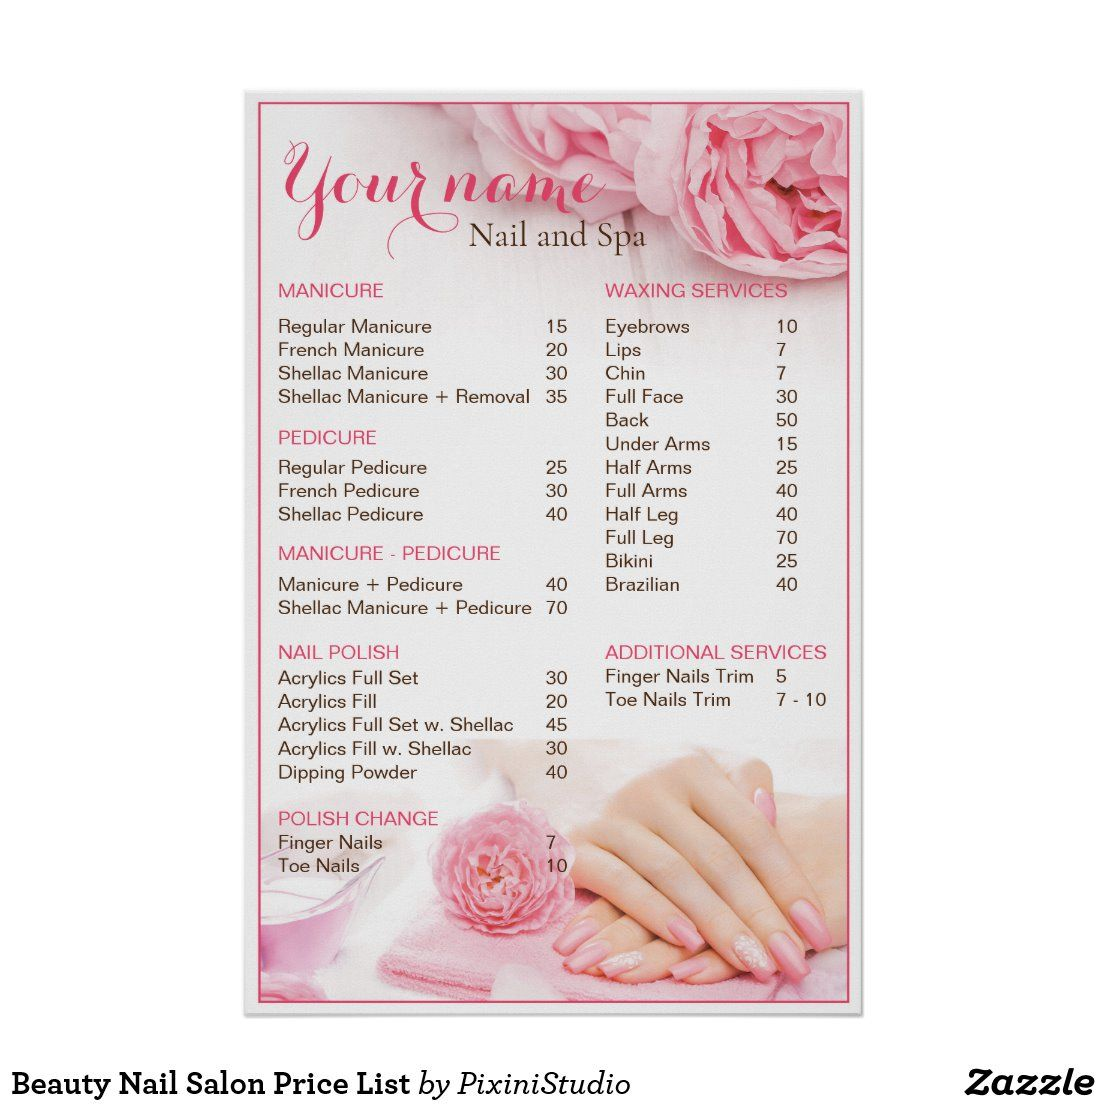 Beauty Nail Salon Price List Poster Zazzle Com In 2020 Nail Salon Prices Beauty Nail Salon Salon Price List